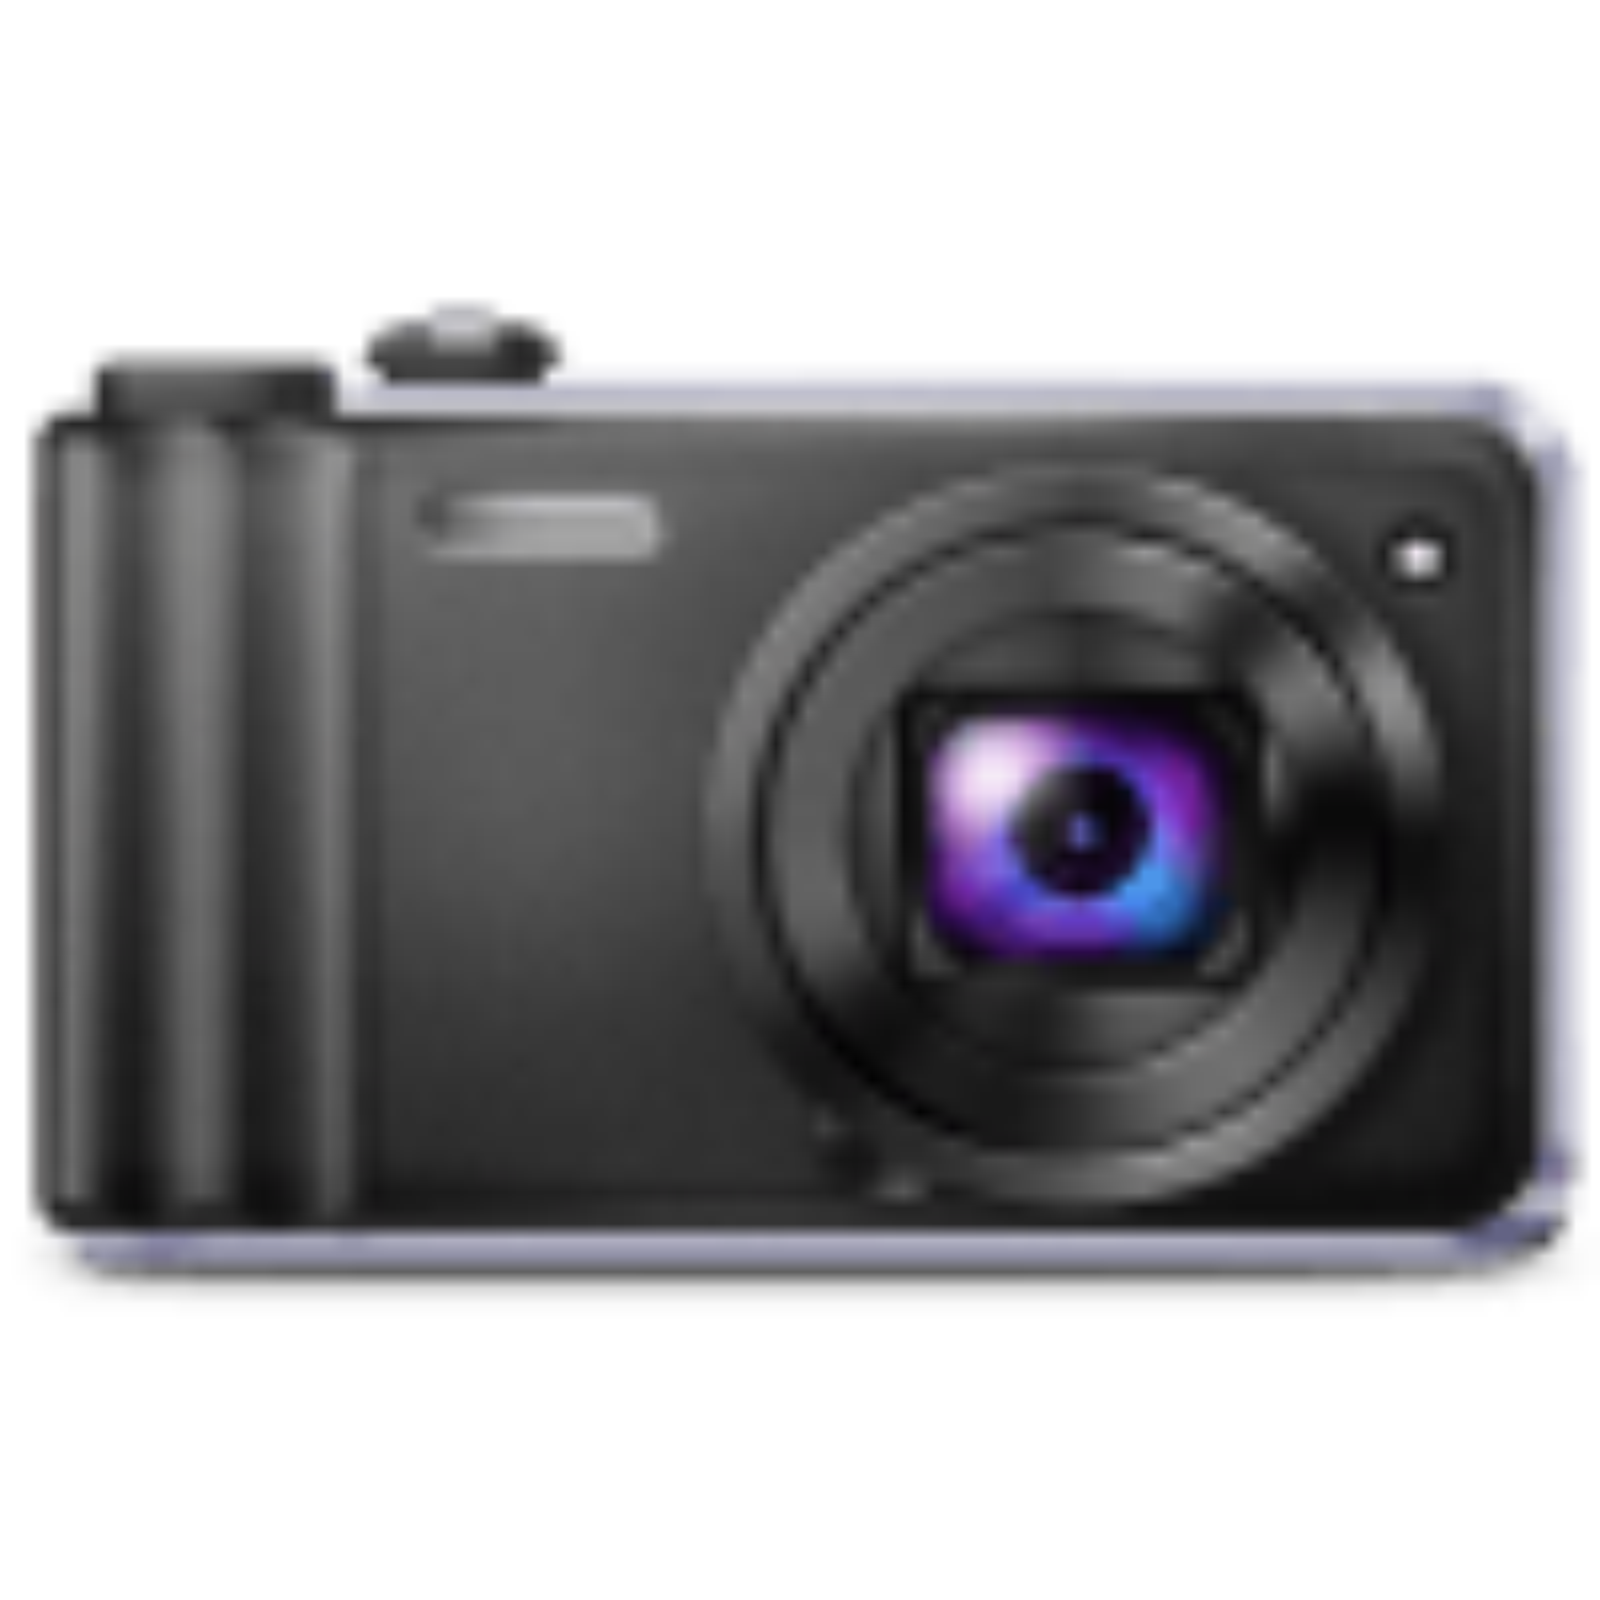 Ulead Photo Explorer